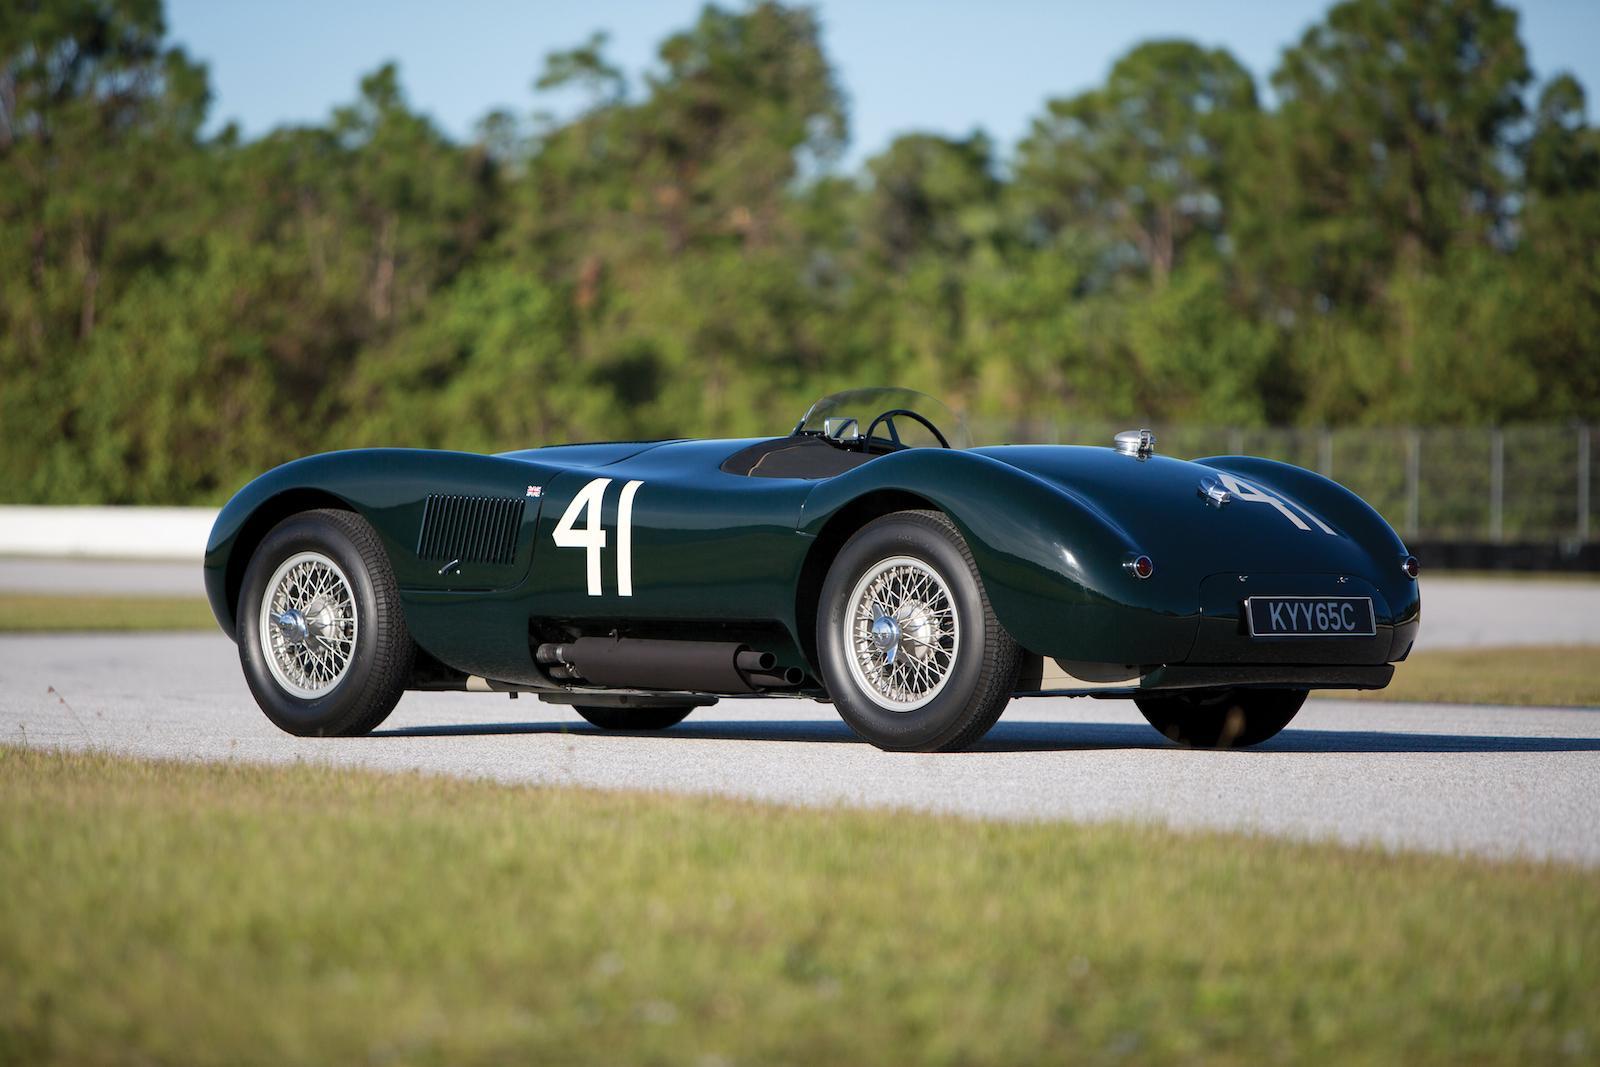 Ex-Phil Hill Jaguar C-type at RM New York sale